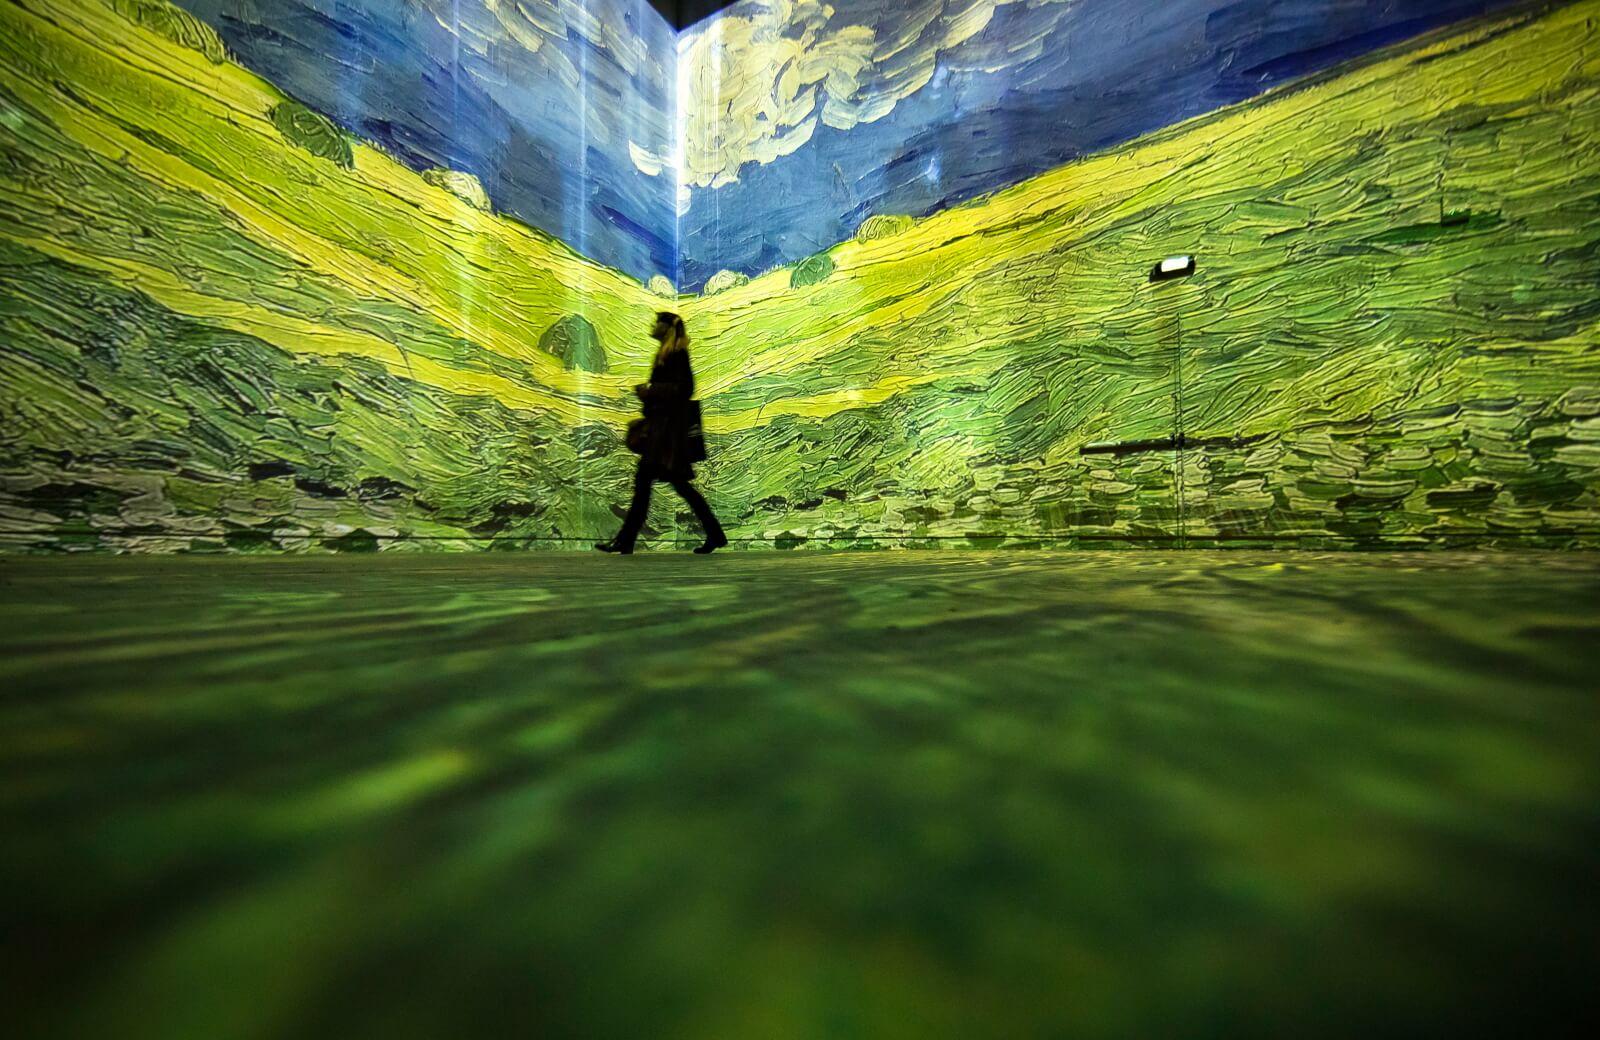 Wystawa dzieł Vincenta Van Gogha w Paryżu fot. EPA/IAN LANGSDON